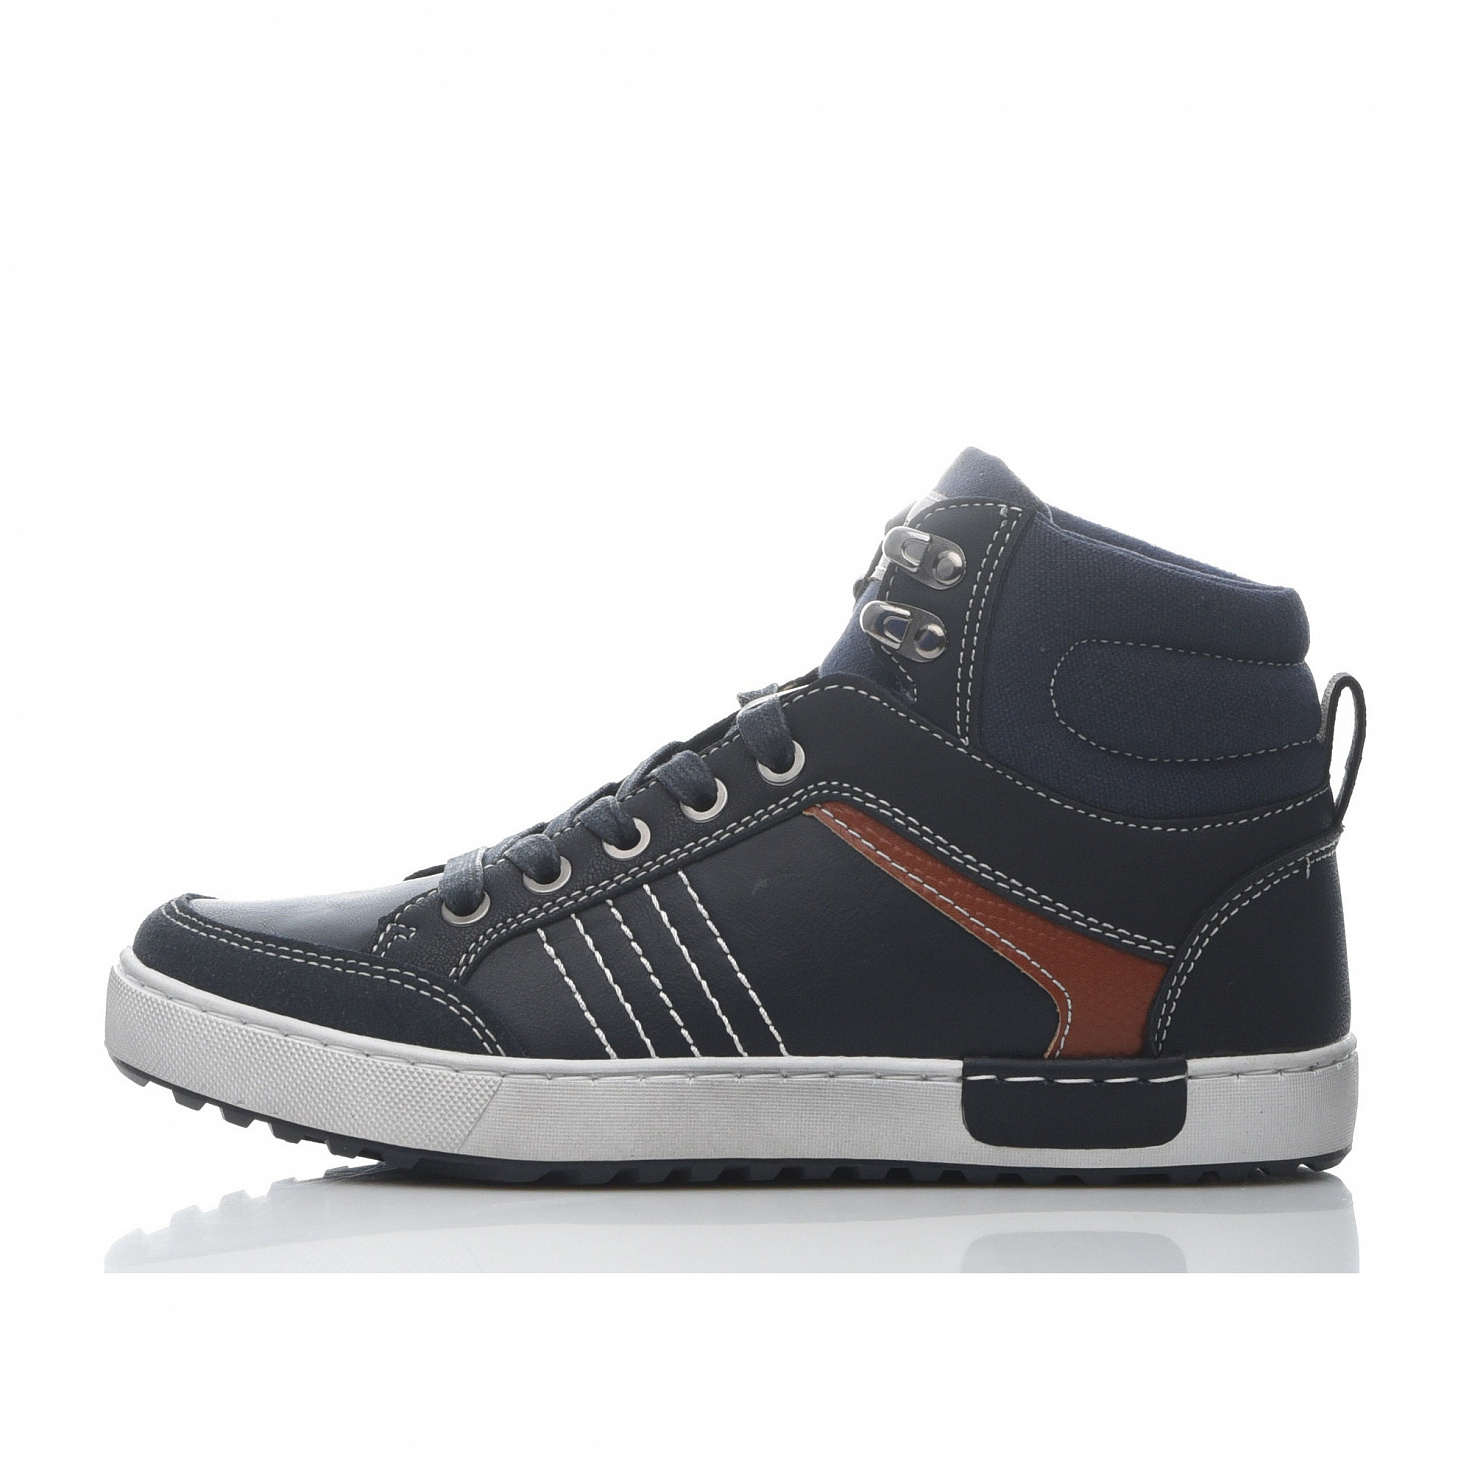 Купить 189-82BO-049SR, Ботинки для мальчиков ZENDEN, цв. синий, р-р 38,